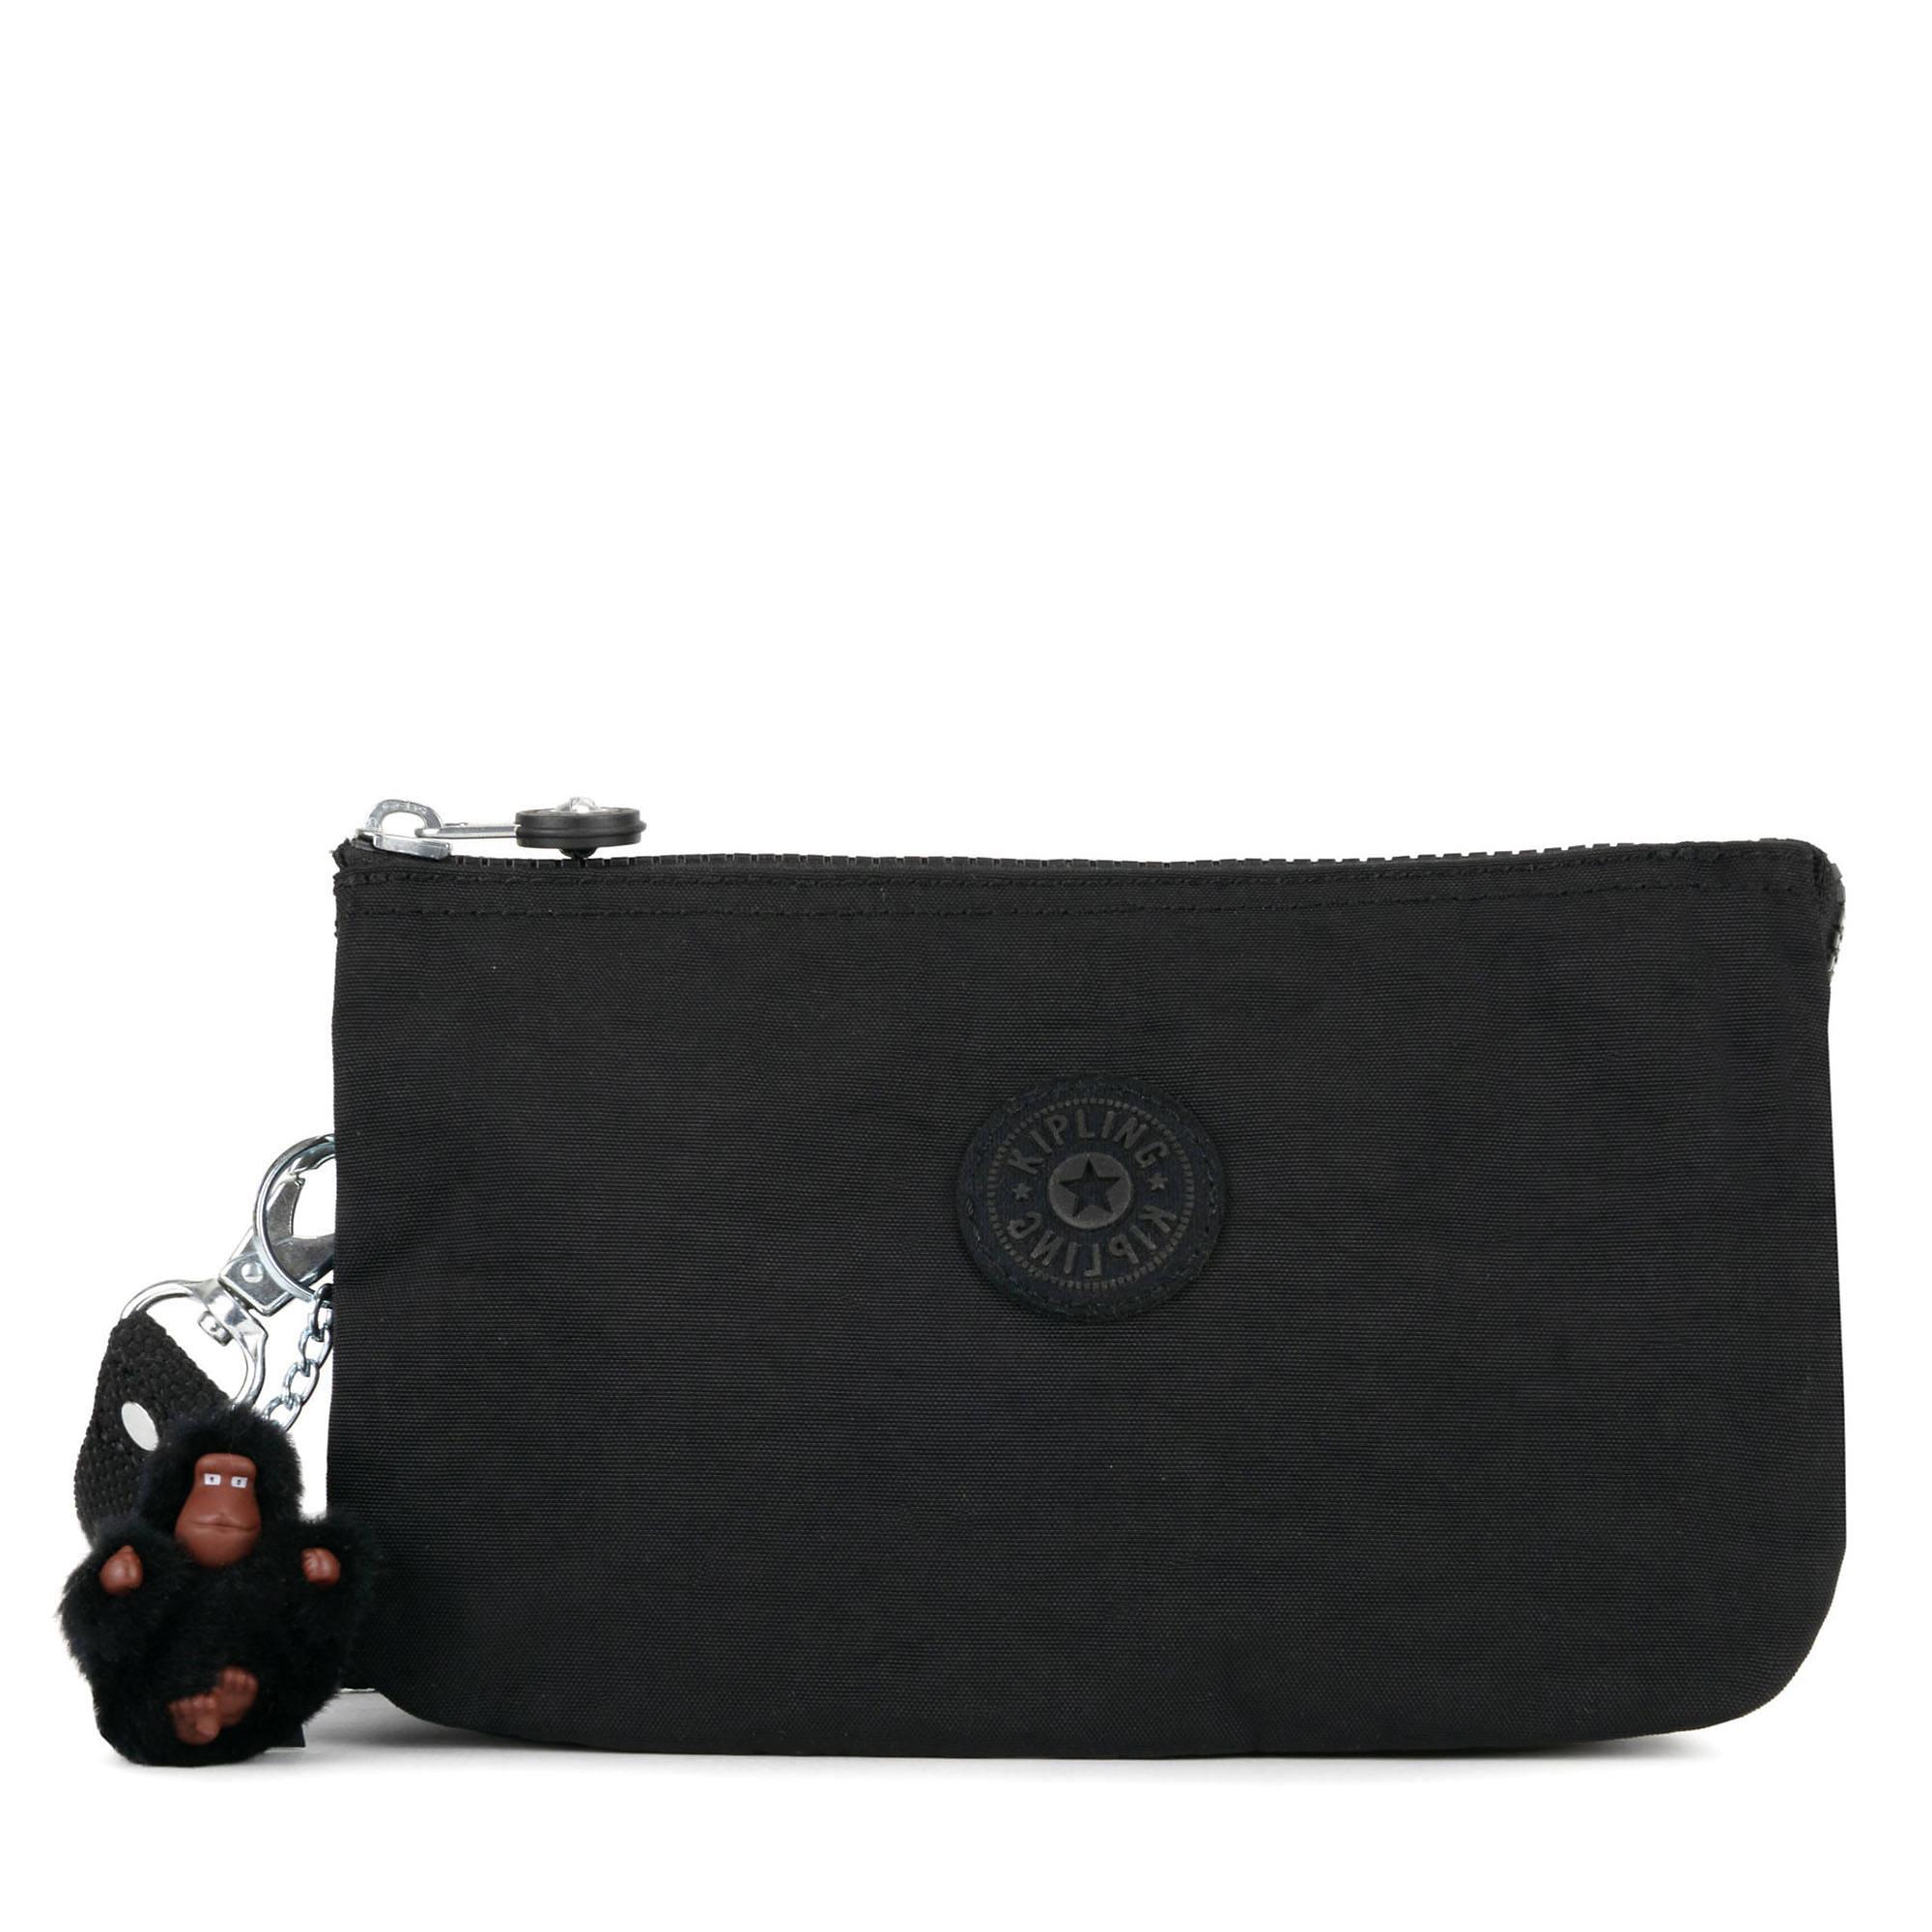 0e9ac5042ca Creativity Extra Large Pouch,Black Tonal Zipper,large